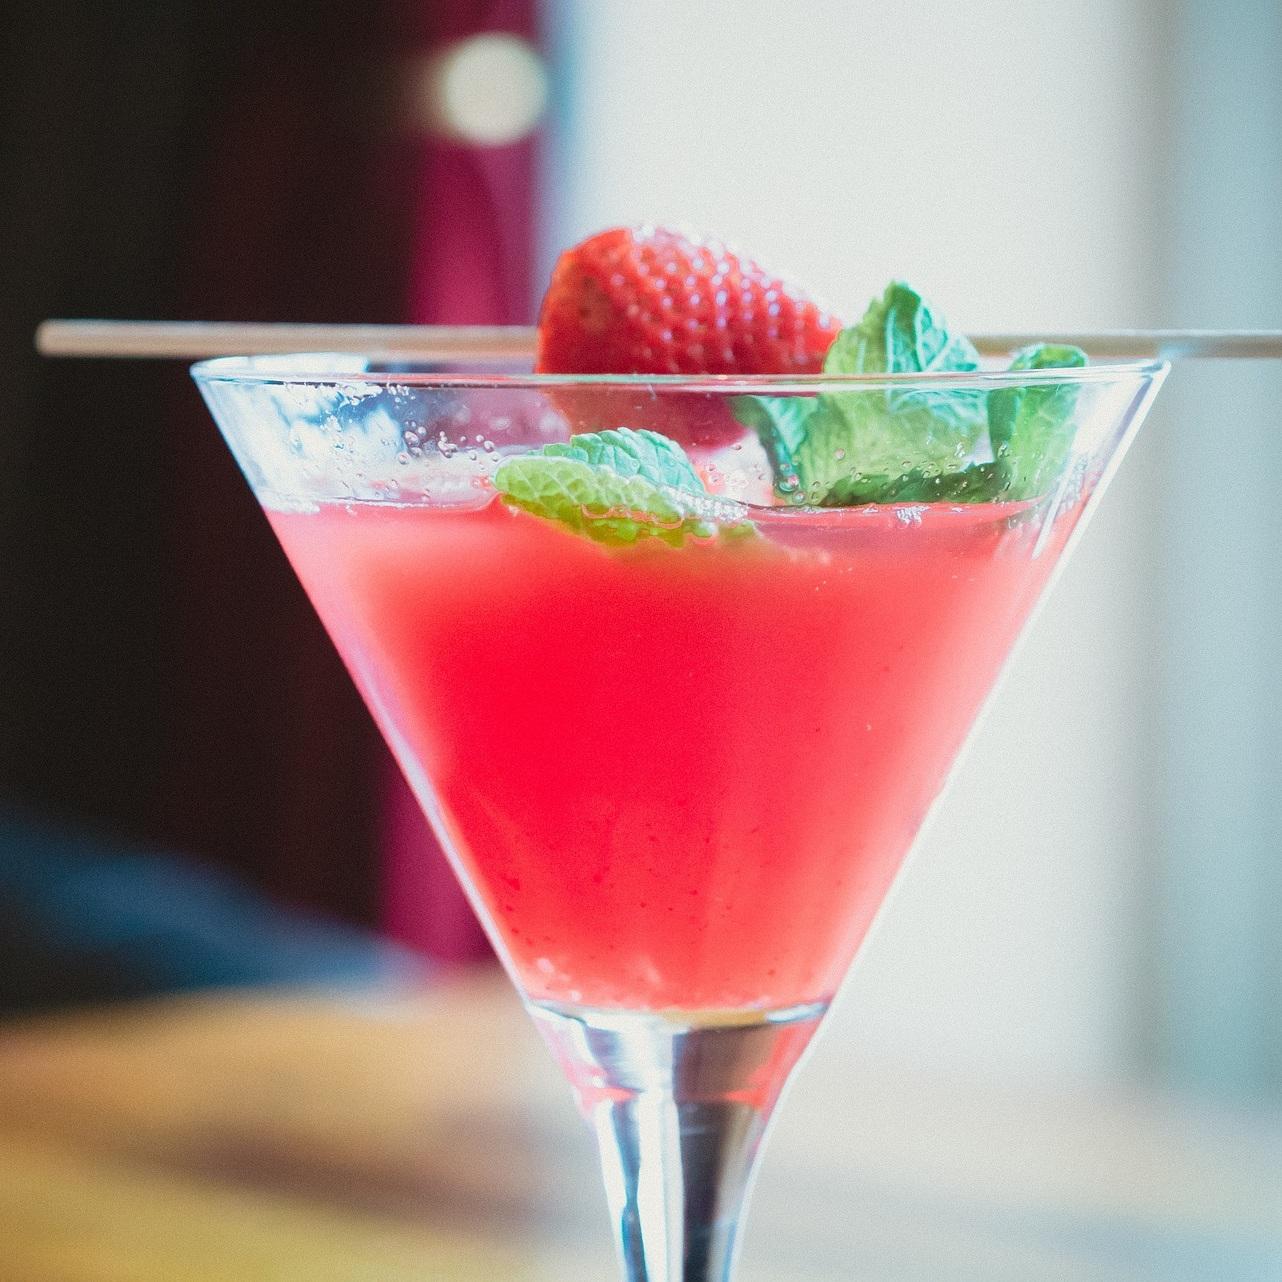 cocktail-919074_1920.jpg